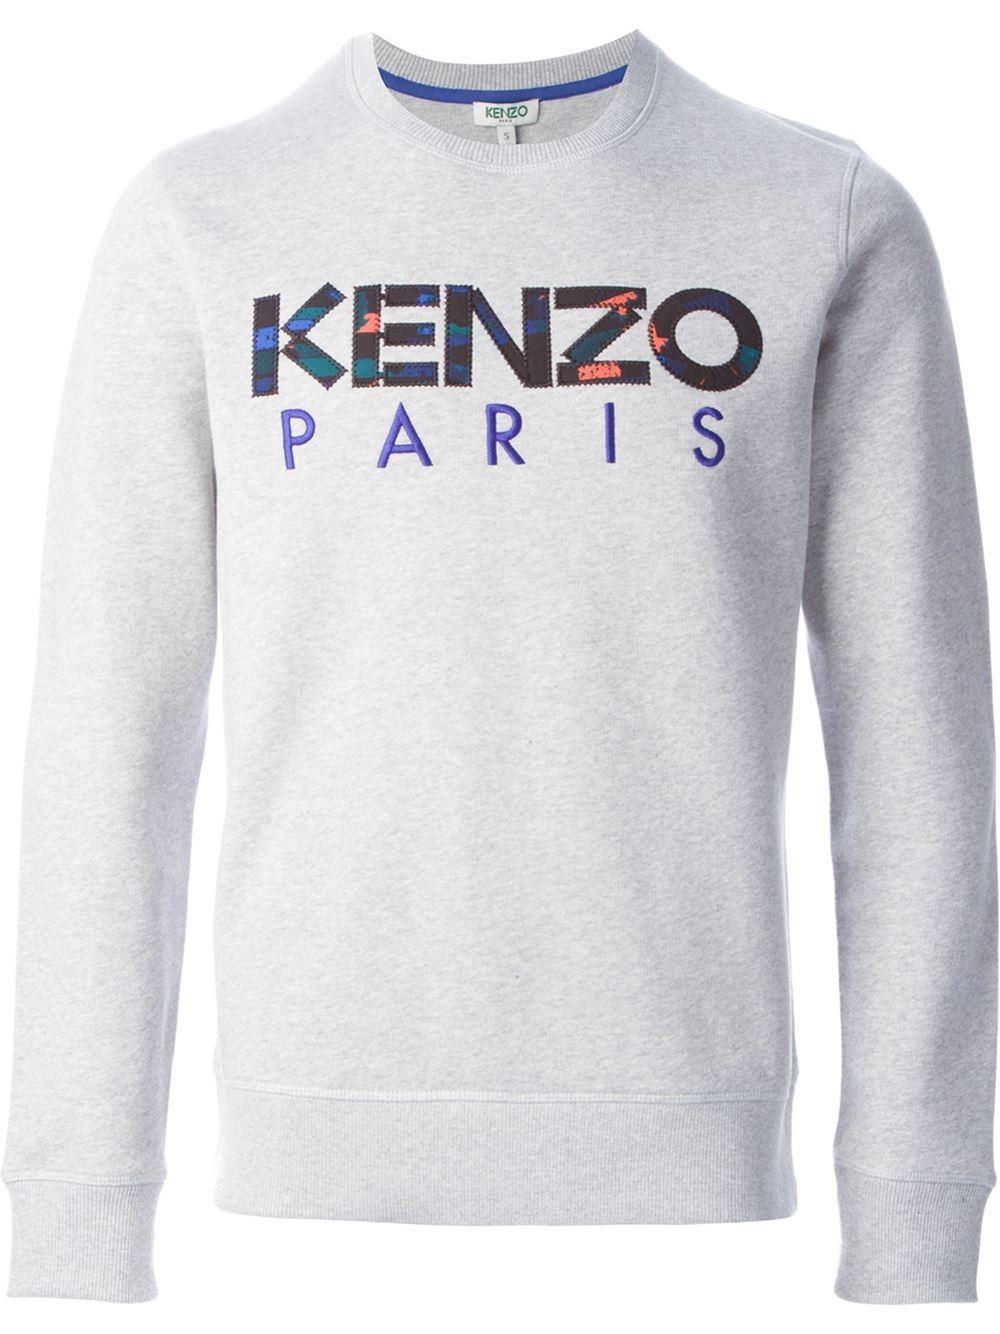 Kenzo Paris Sweatshirt Sale Sweater Tunic